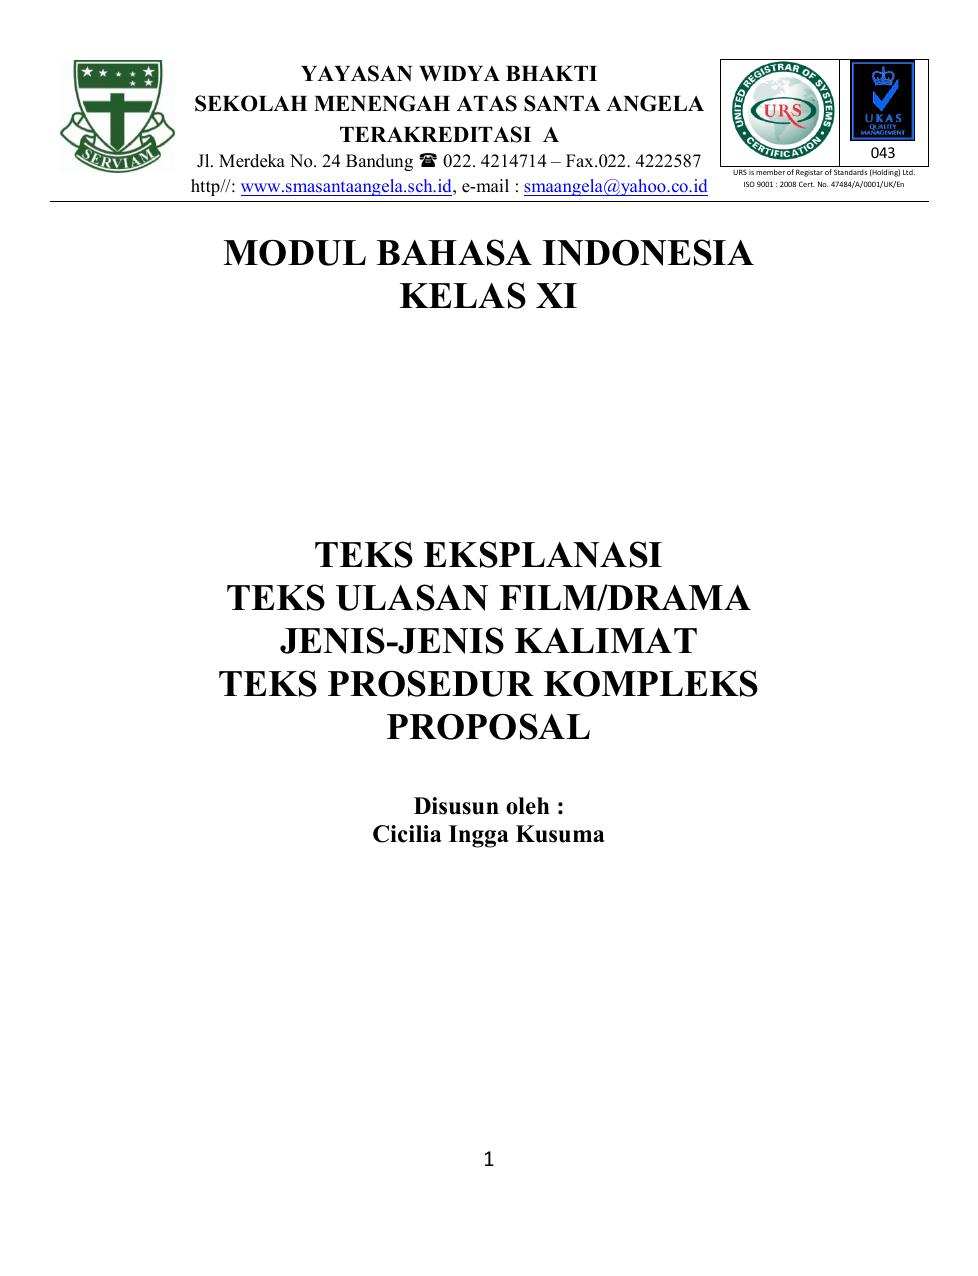 Materi Teks Eksplanasi Kelas 11 : materi, eksplanasi, kelas, Modul, Bahasa, Indonesia, Kelas, Eksplanasi